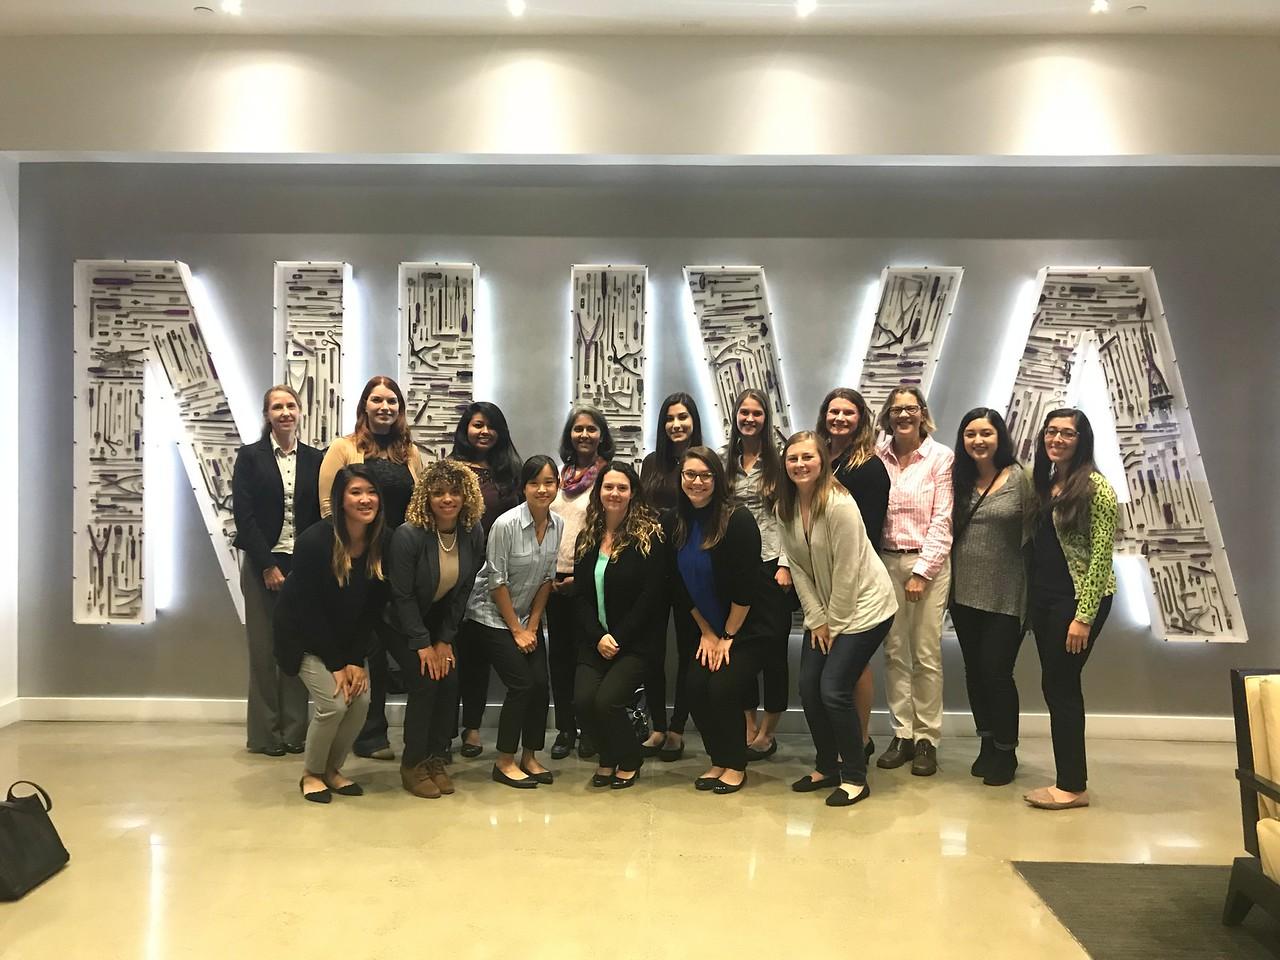 Resume LinkedIn Workshop at NuVasive - April 20, 2018